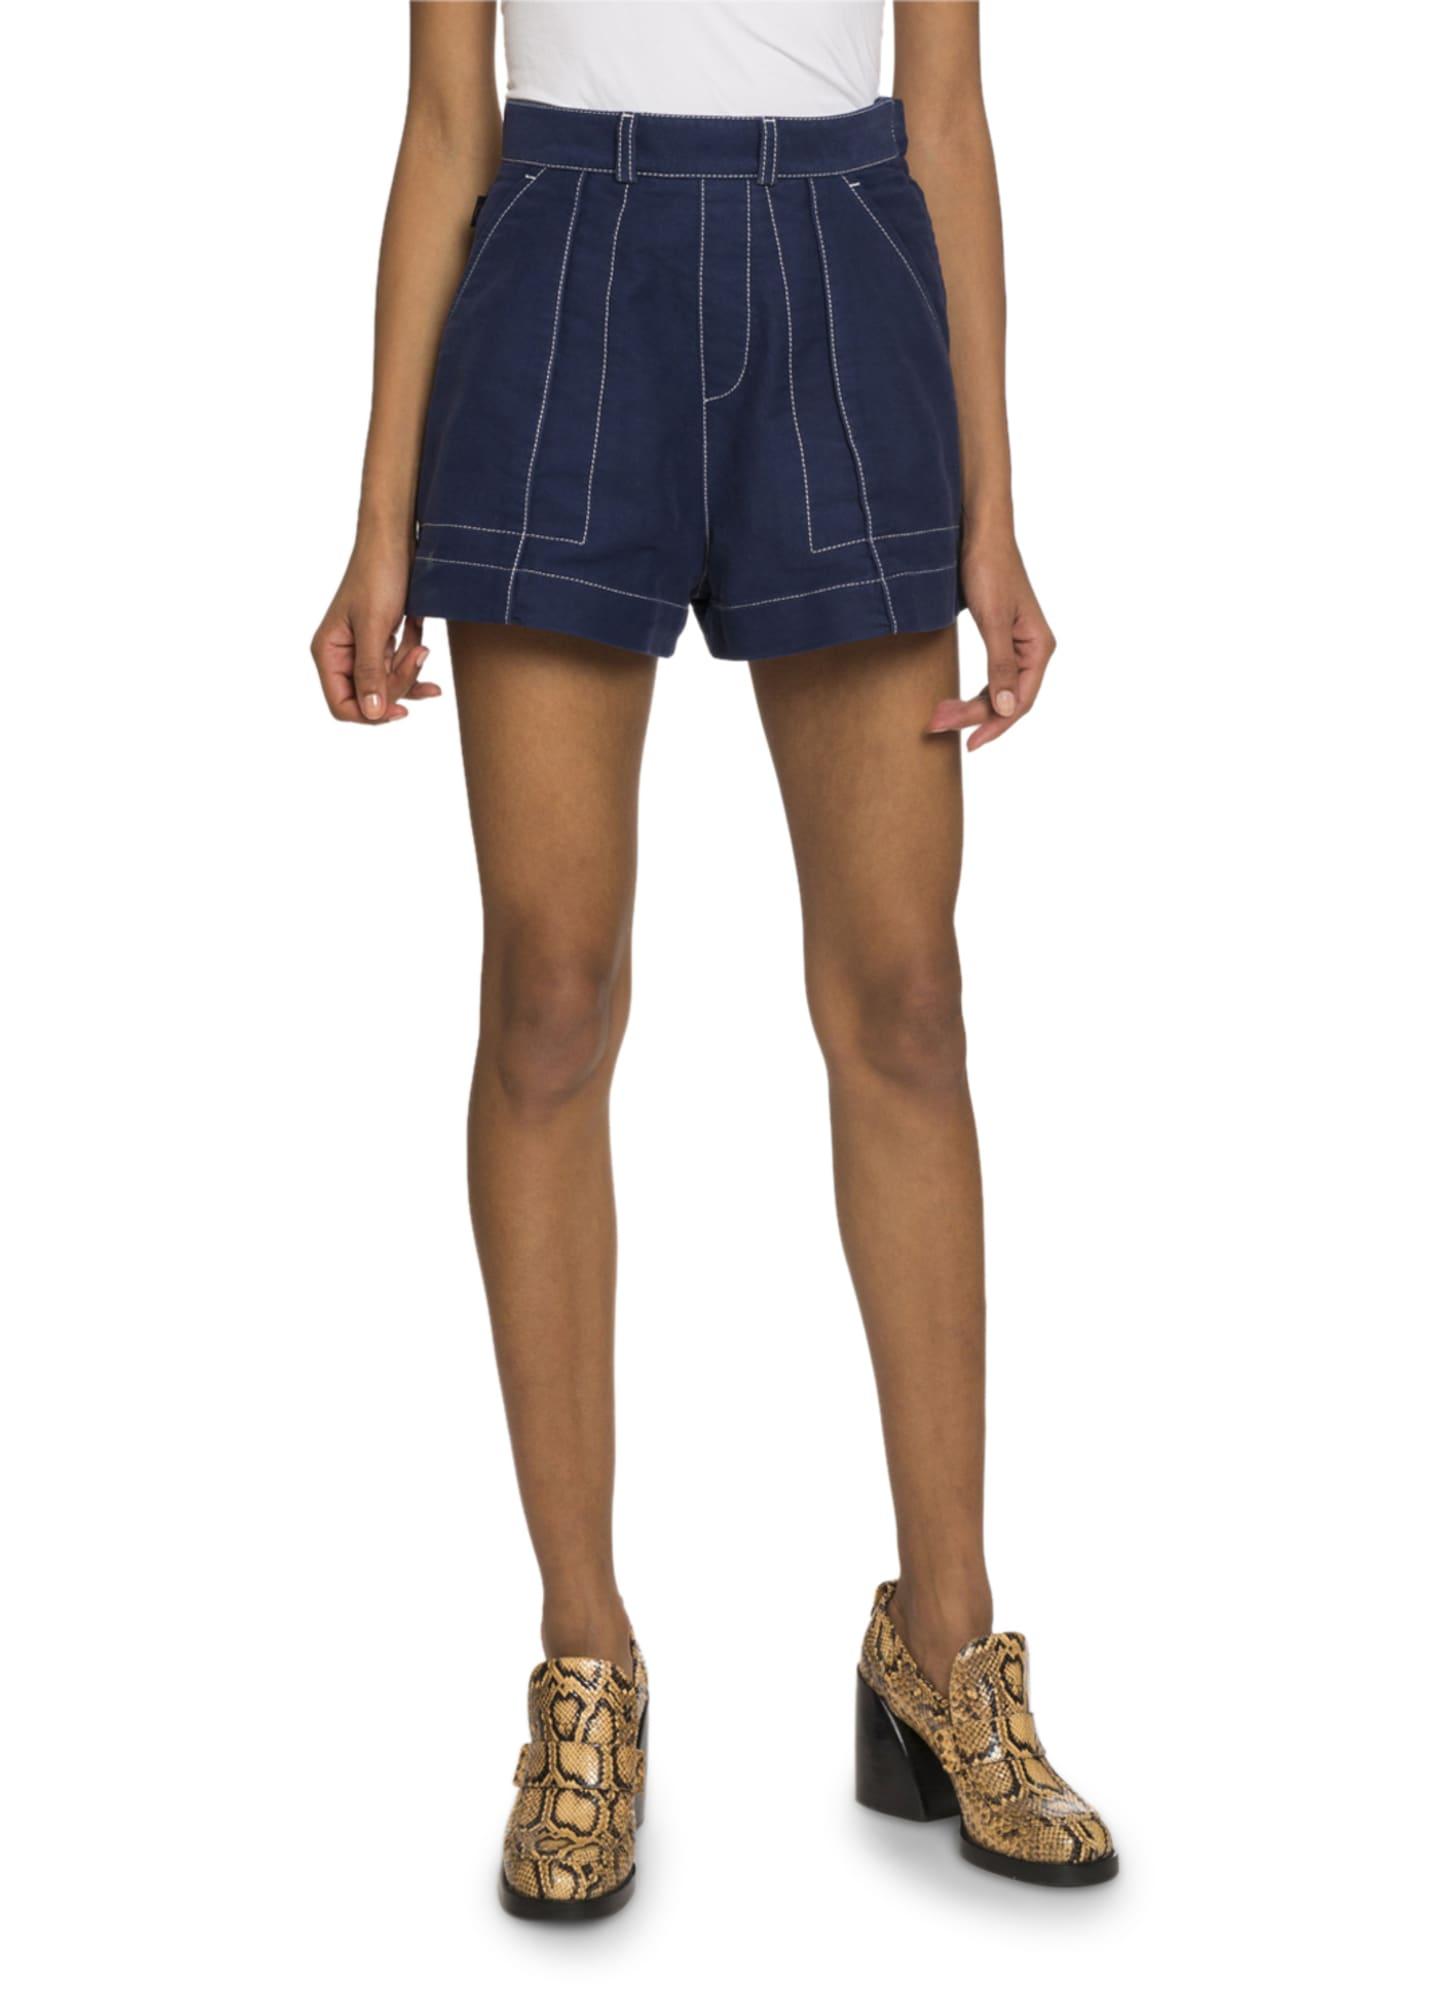 Chloe Topstitched Denim Shorts